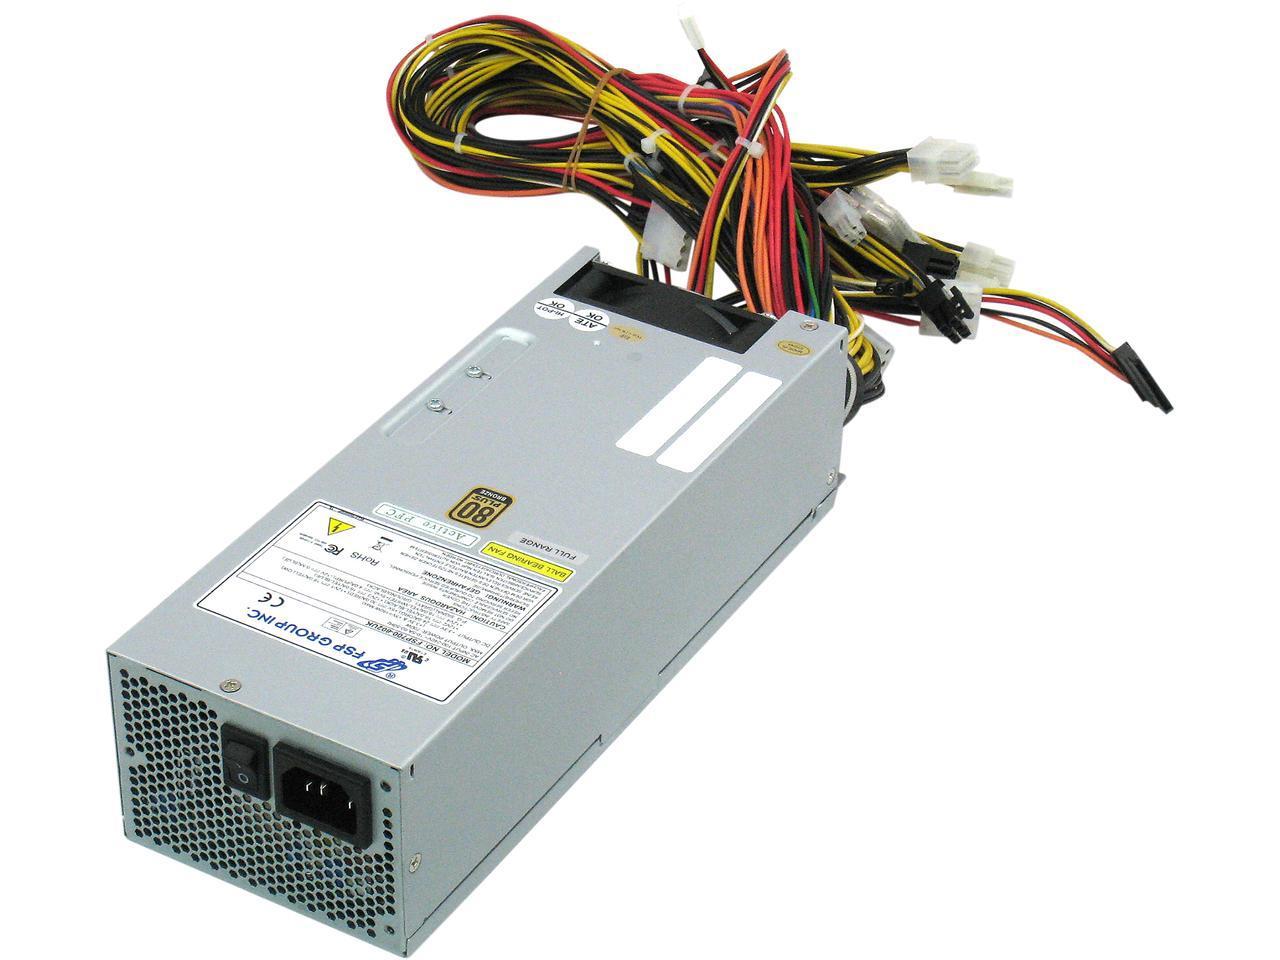 Tech Help - Can you put a GTX or RTX card in a 2U chassis